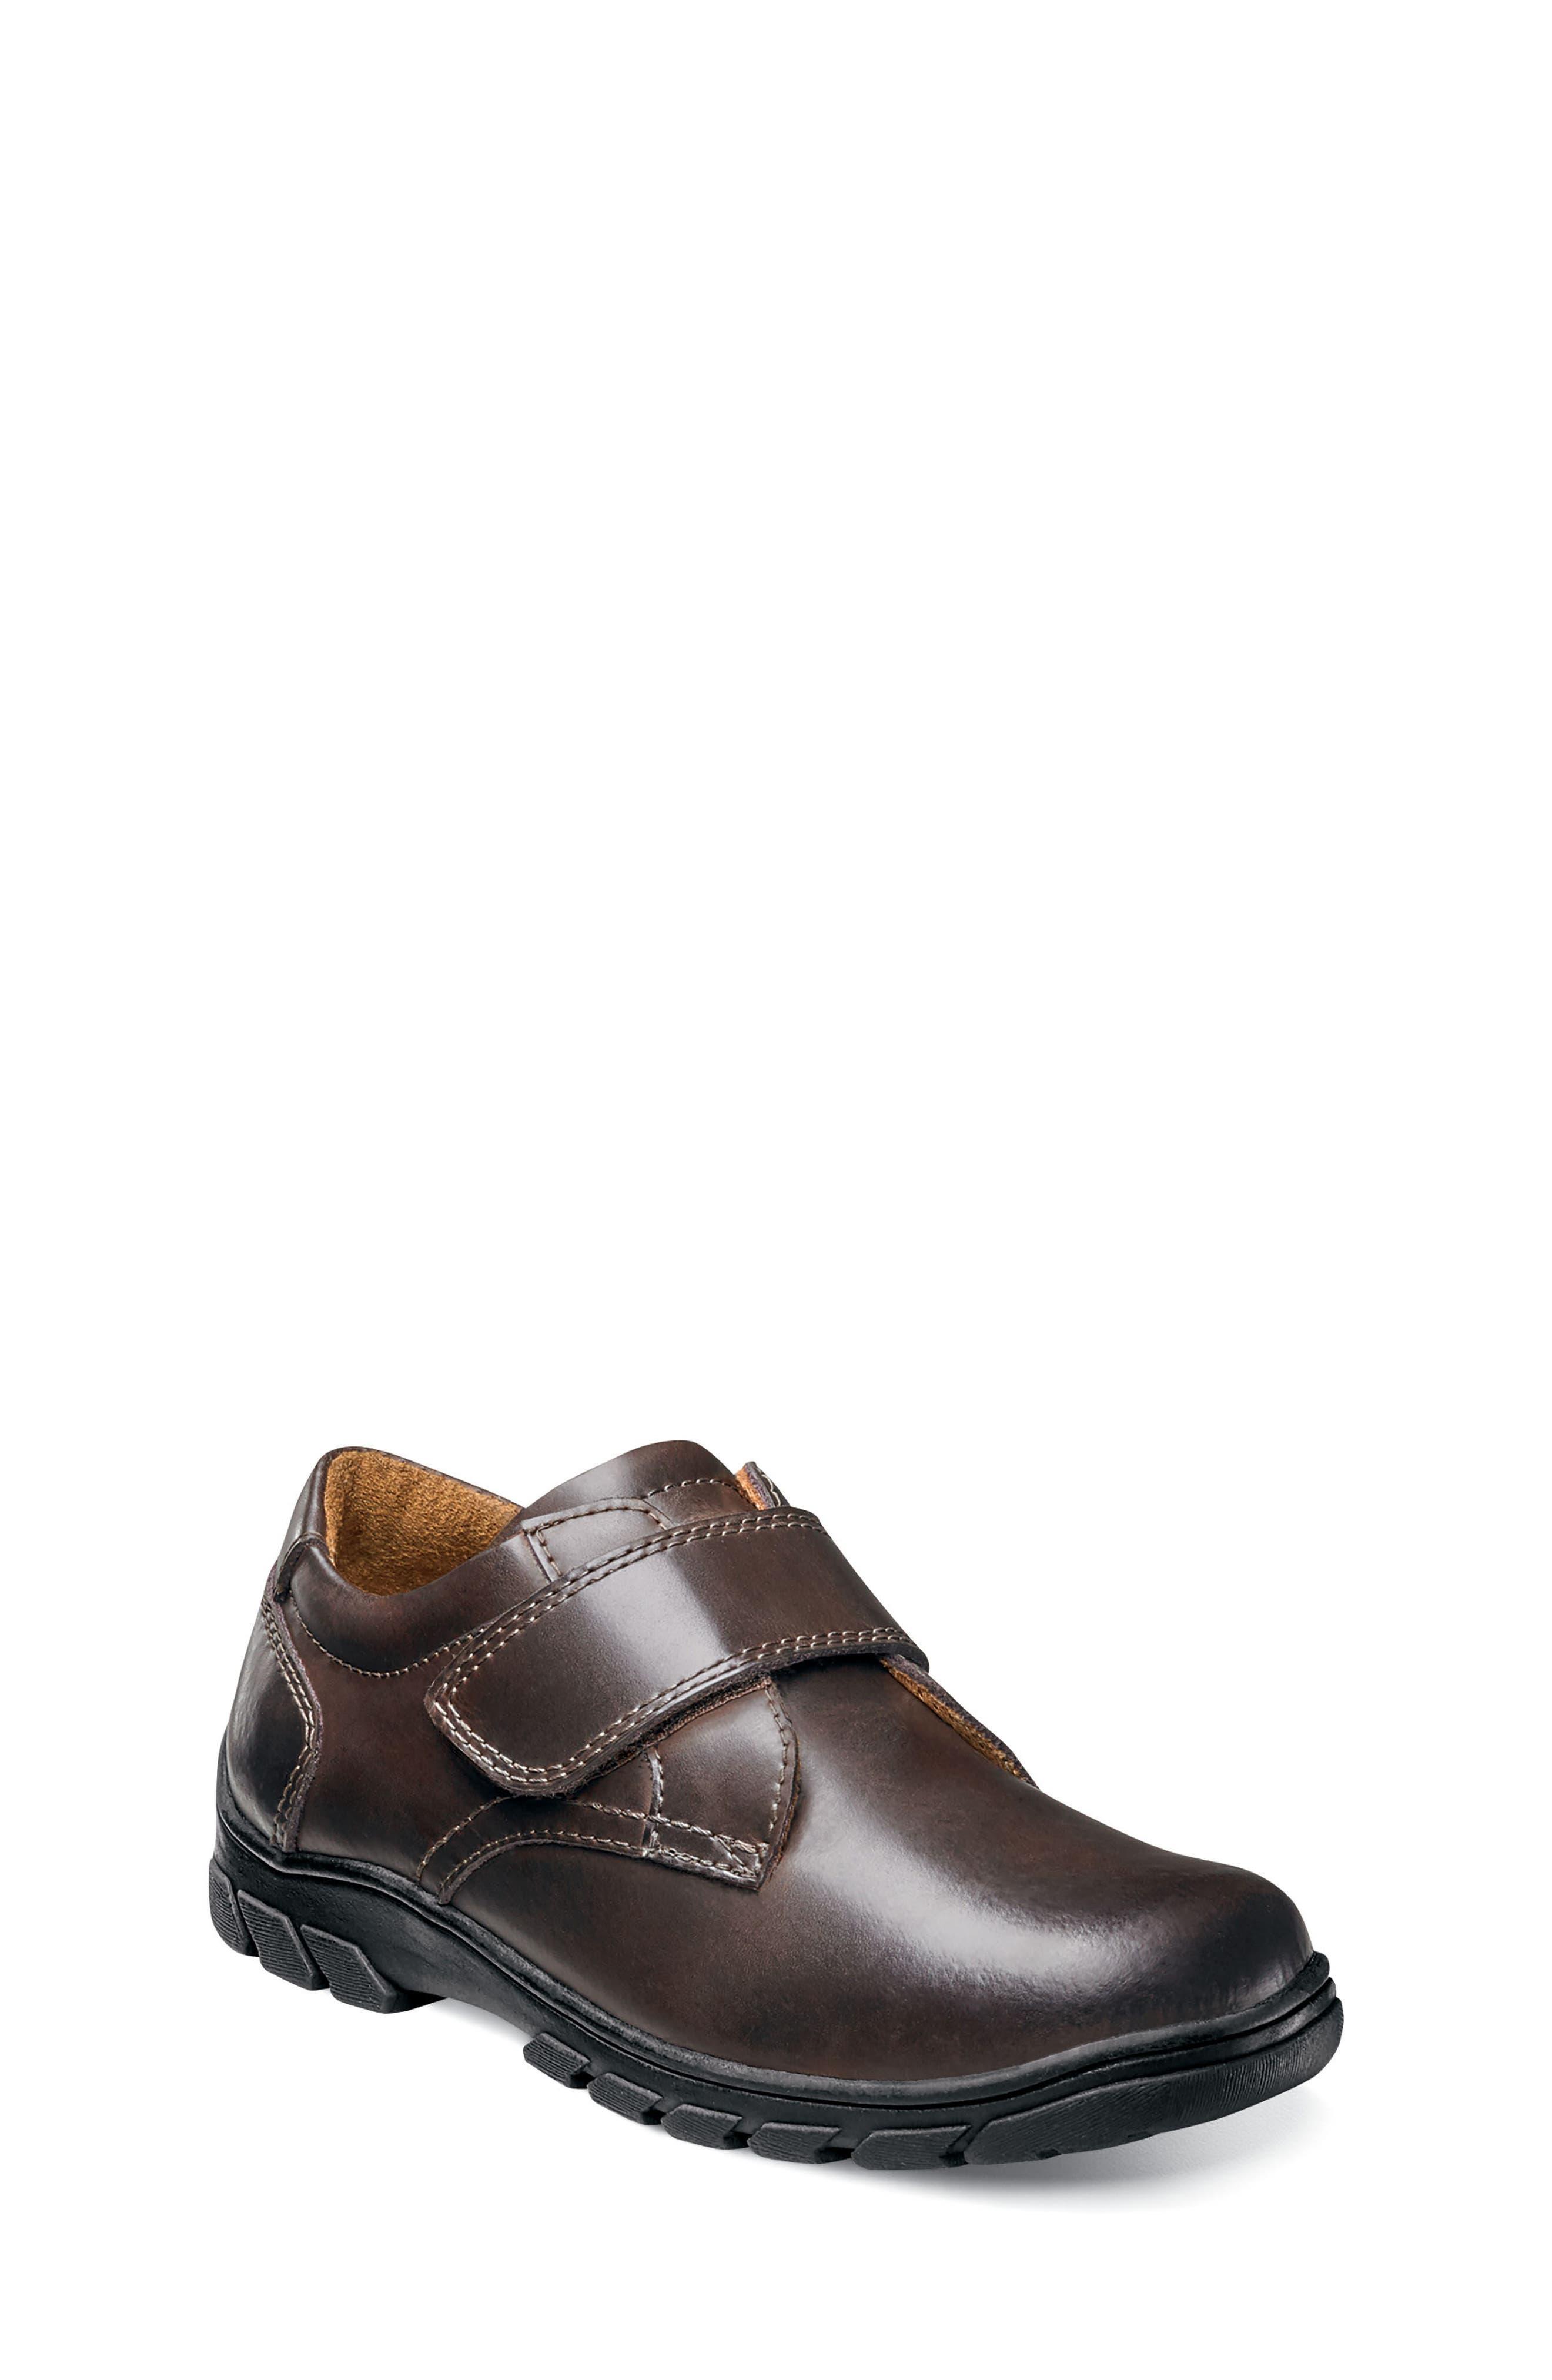 Florsheim Getaway Strap Jr Shoe (Toddler, Little Kid & Big Kid)